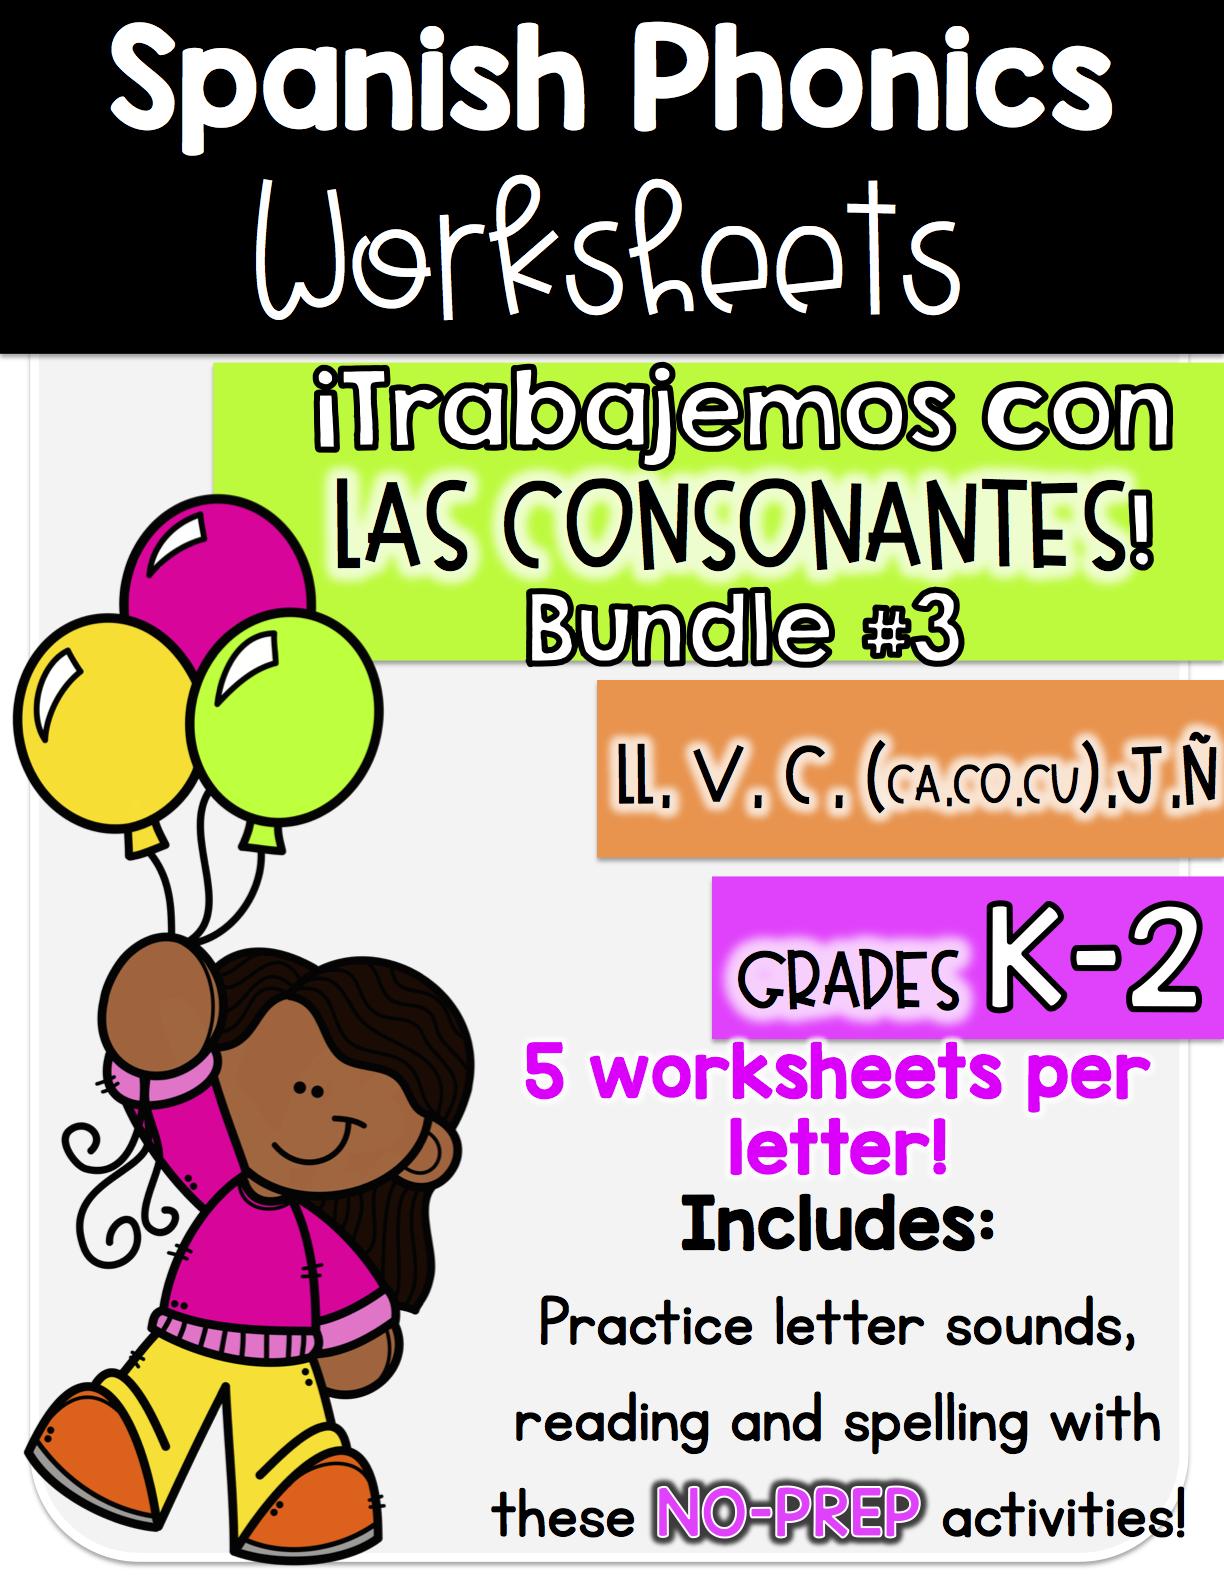 Spanish Phonics Trabajemos Con Las Consonantes Bundle 3